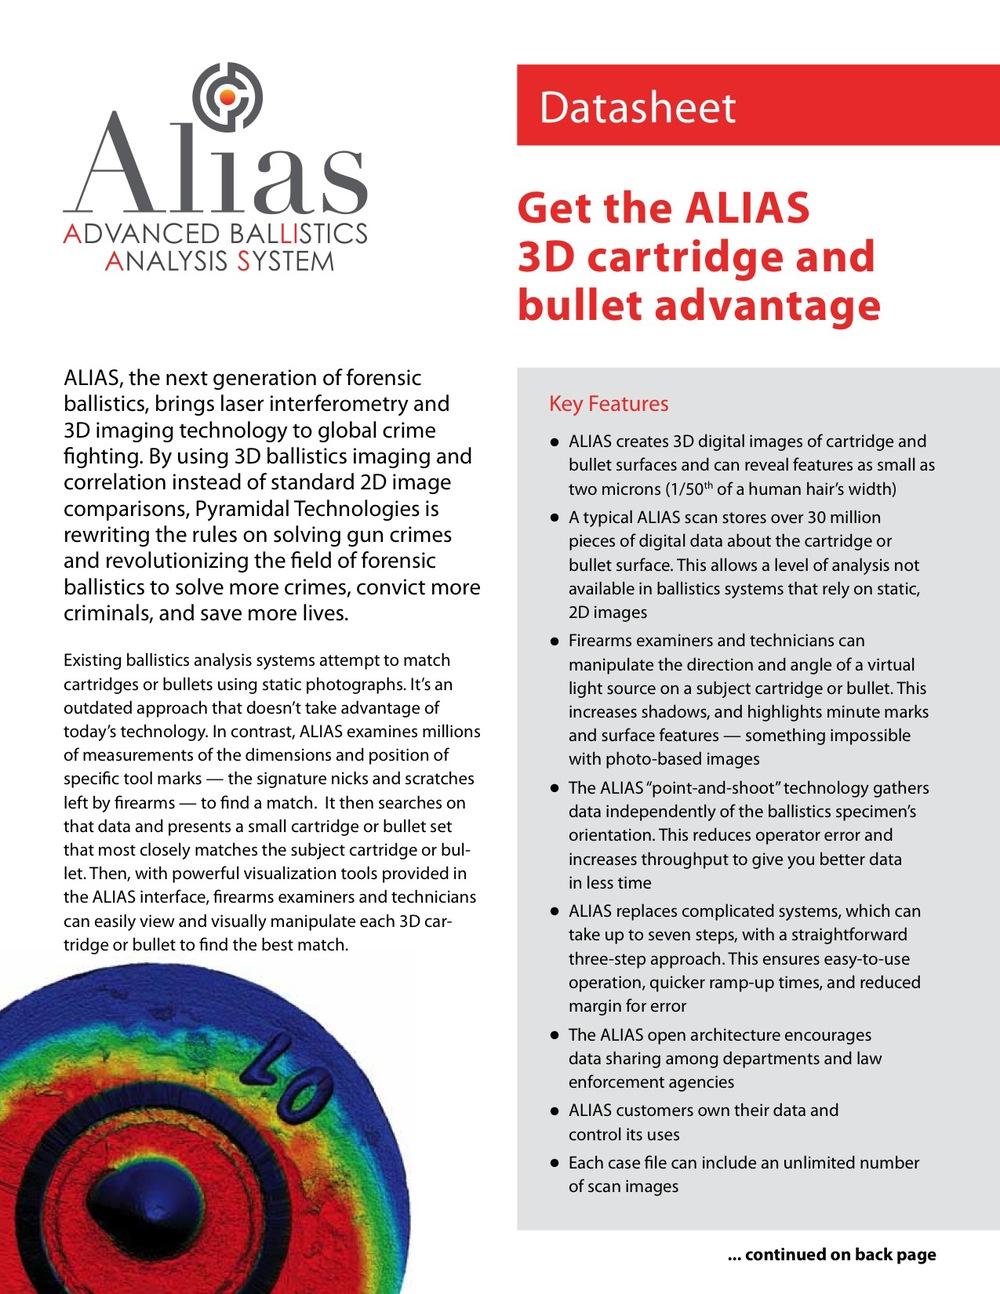 ALIAS_datasheet_may2010_view-page1.jpg